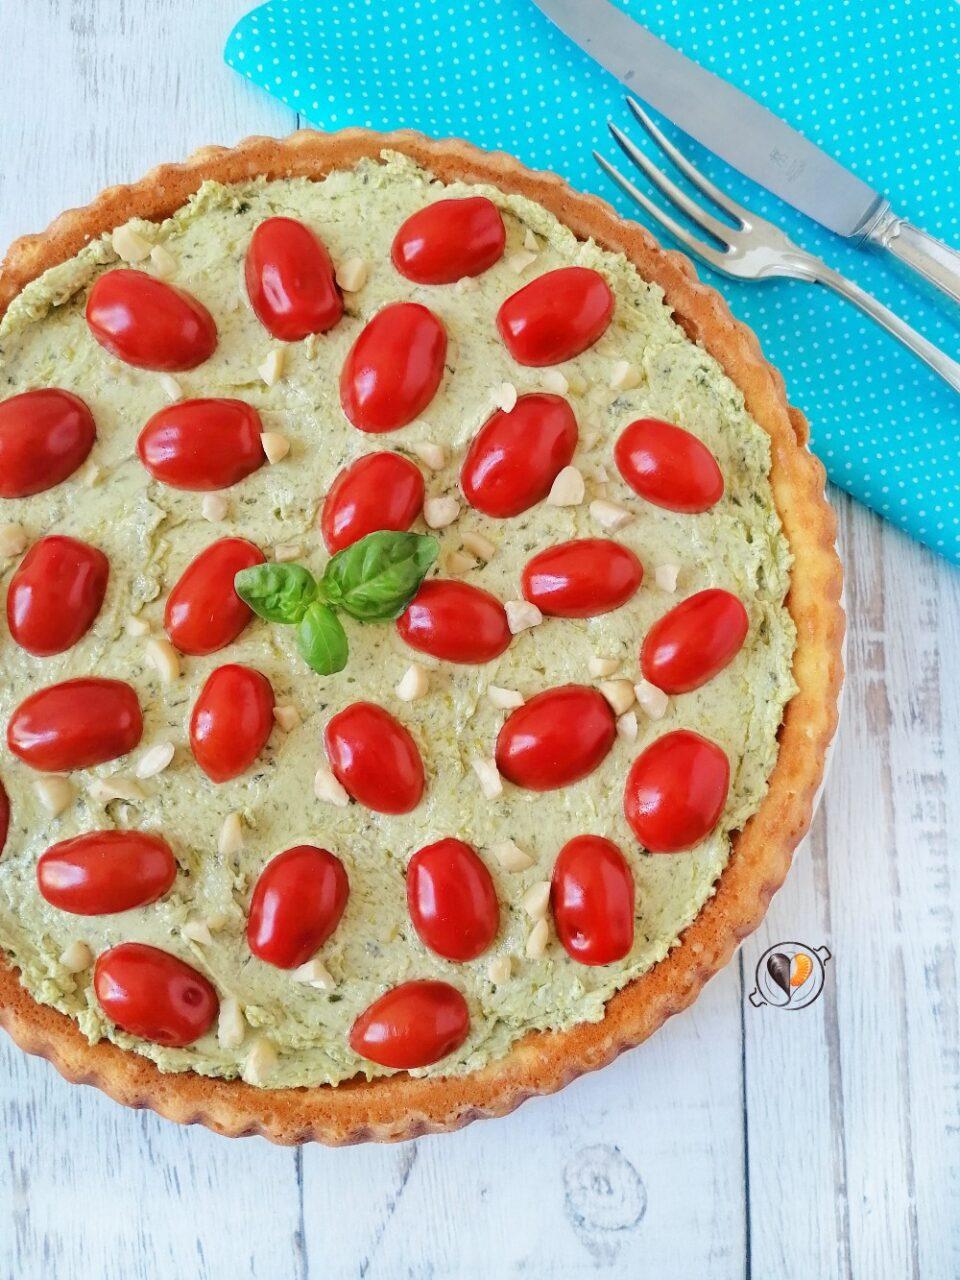 Crostata morbida salata con pesto robiola e pomodorini